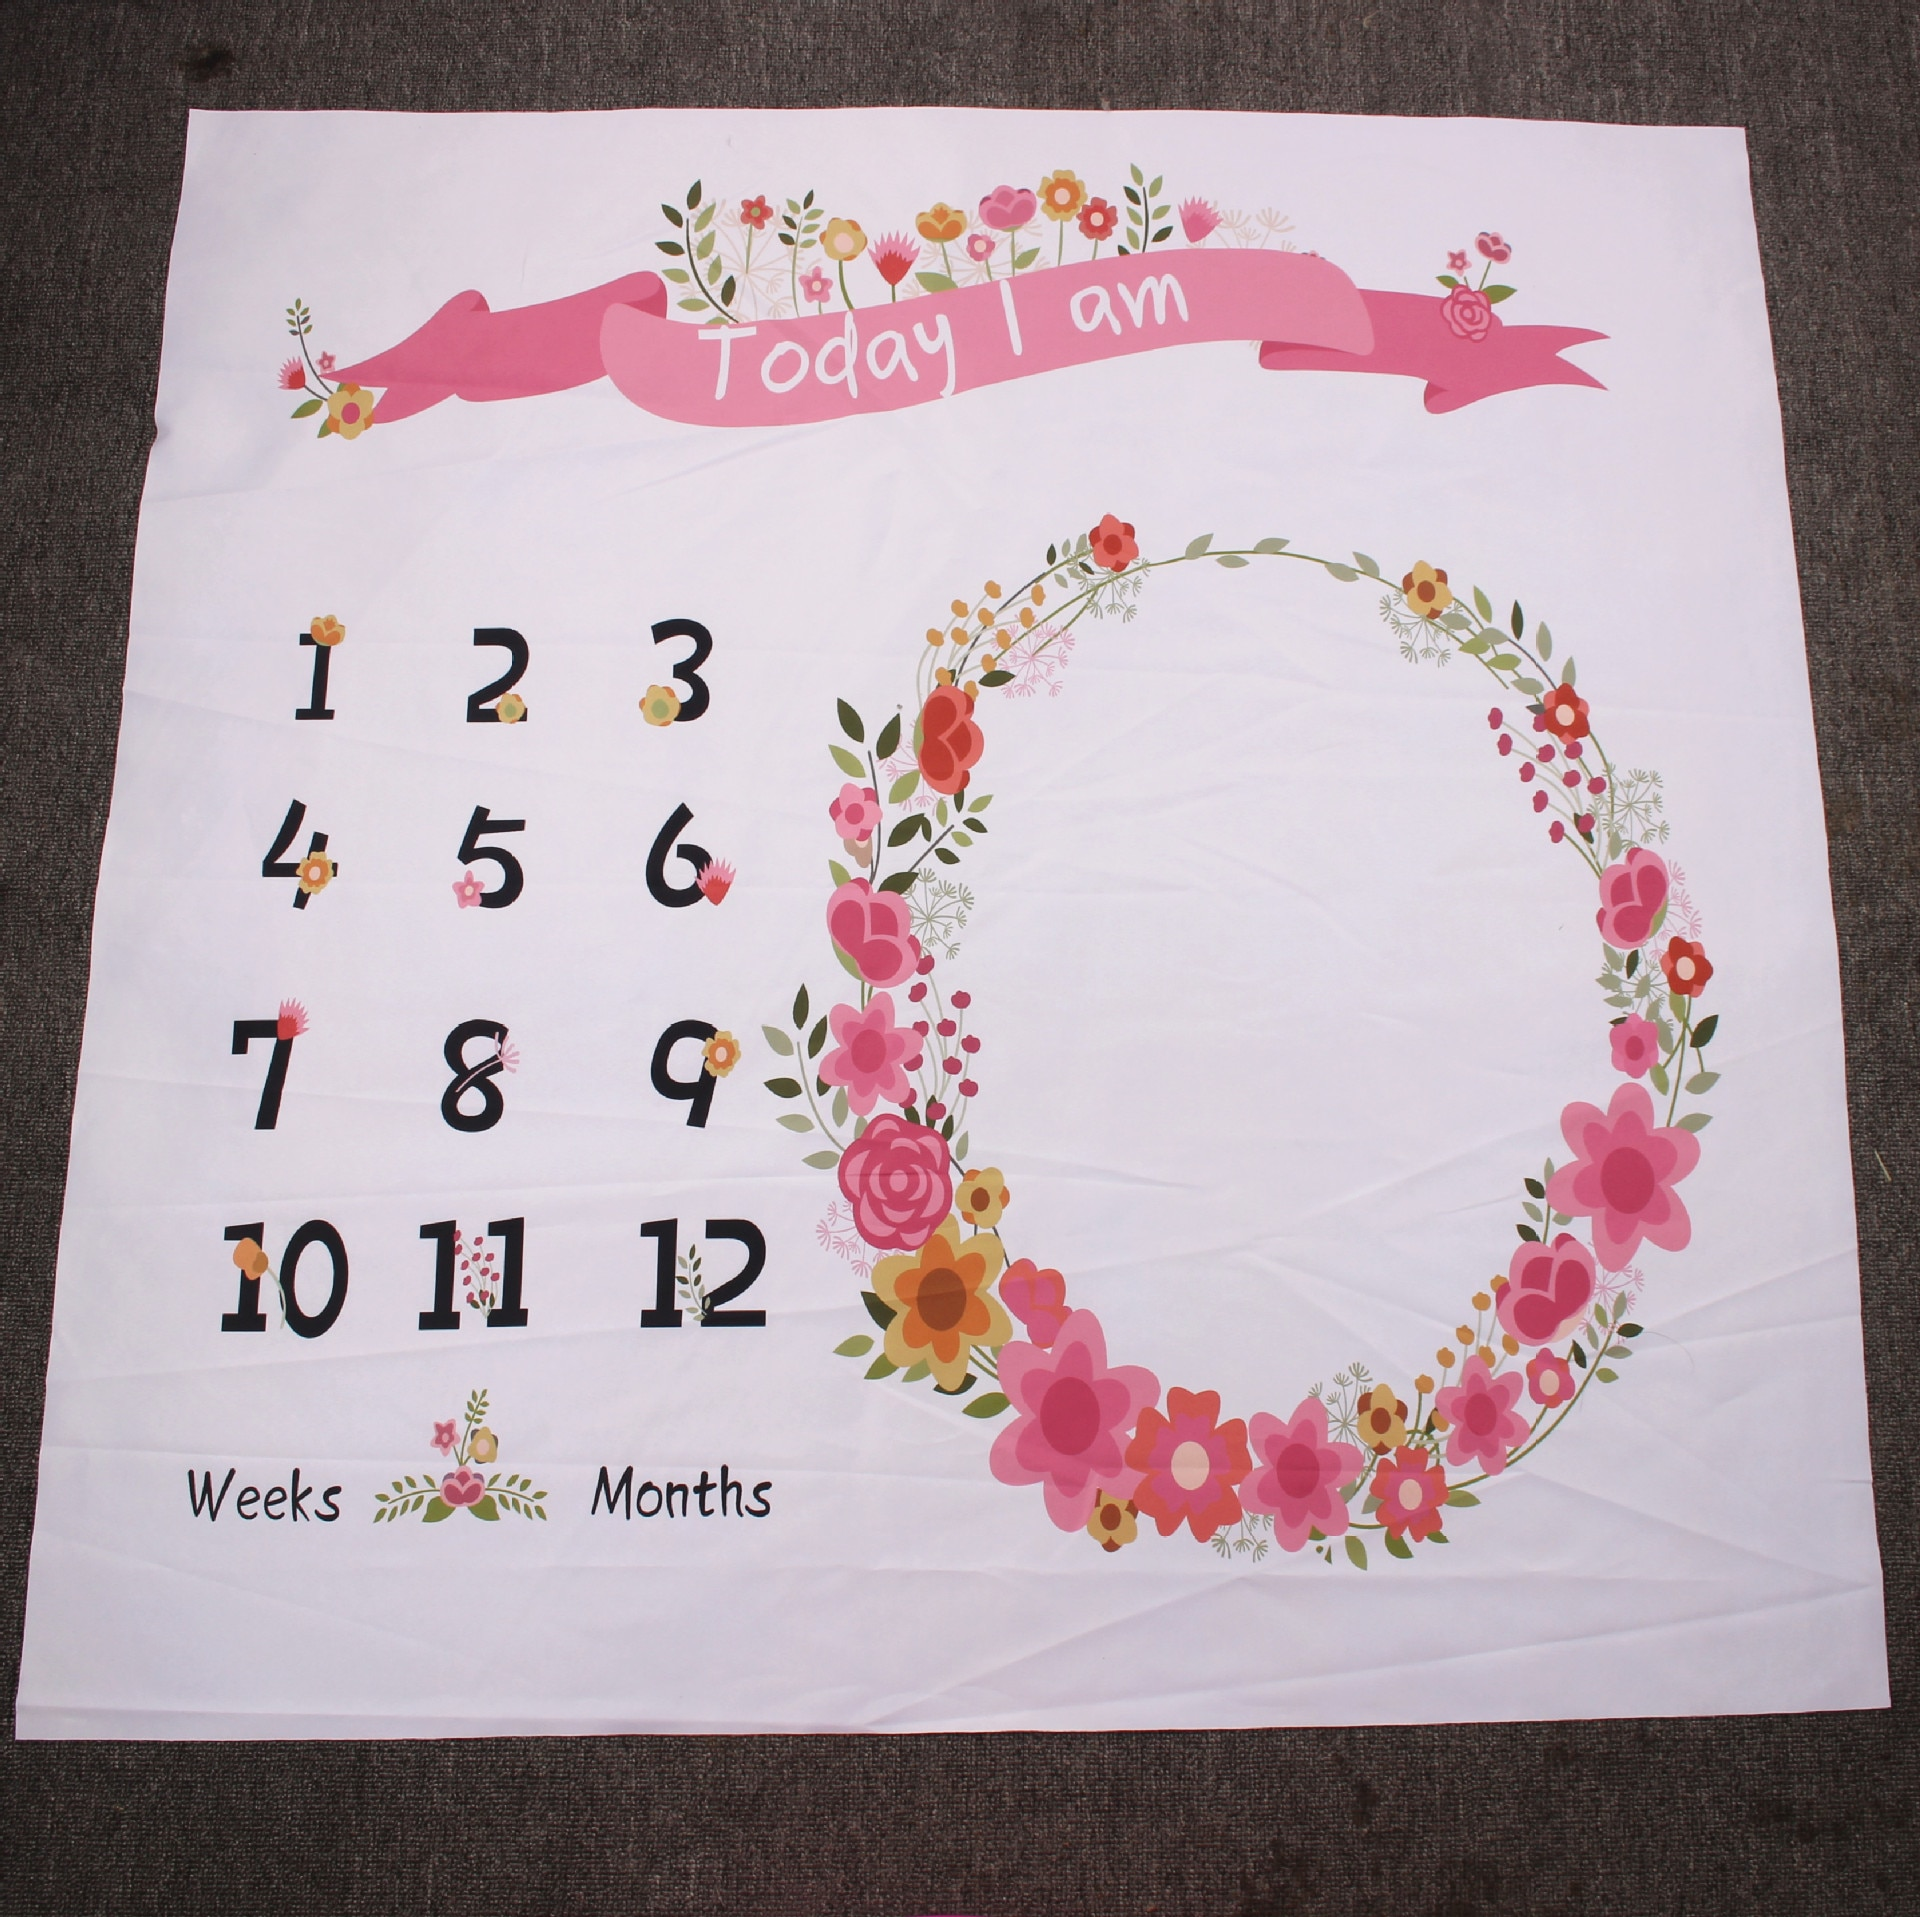 Flower Photography Baby Blanket For Newborn Best Children's Lighting & Home Decor Online Store